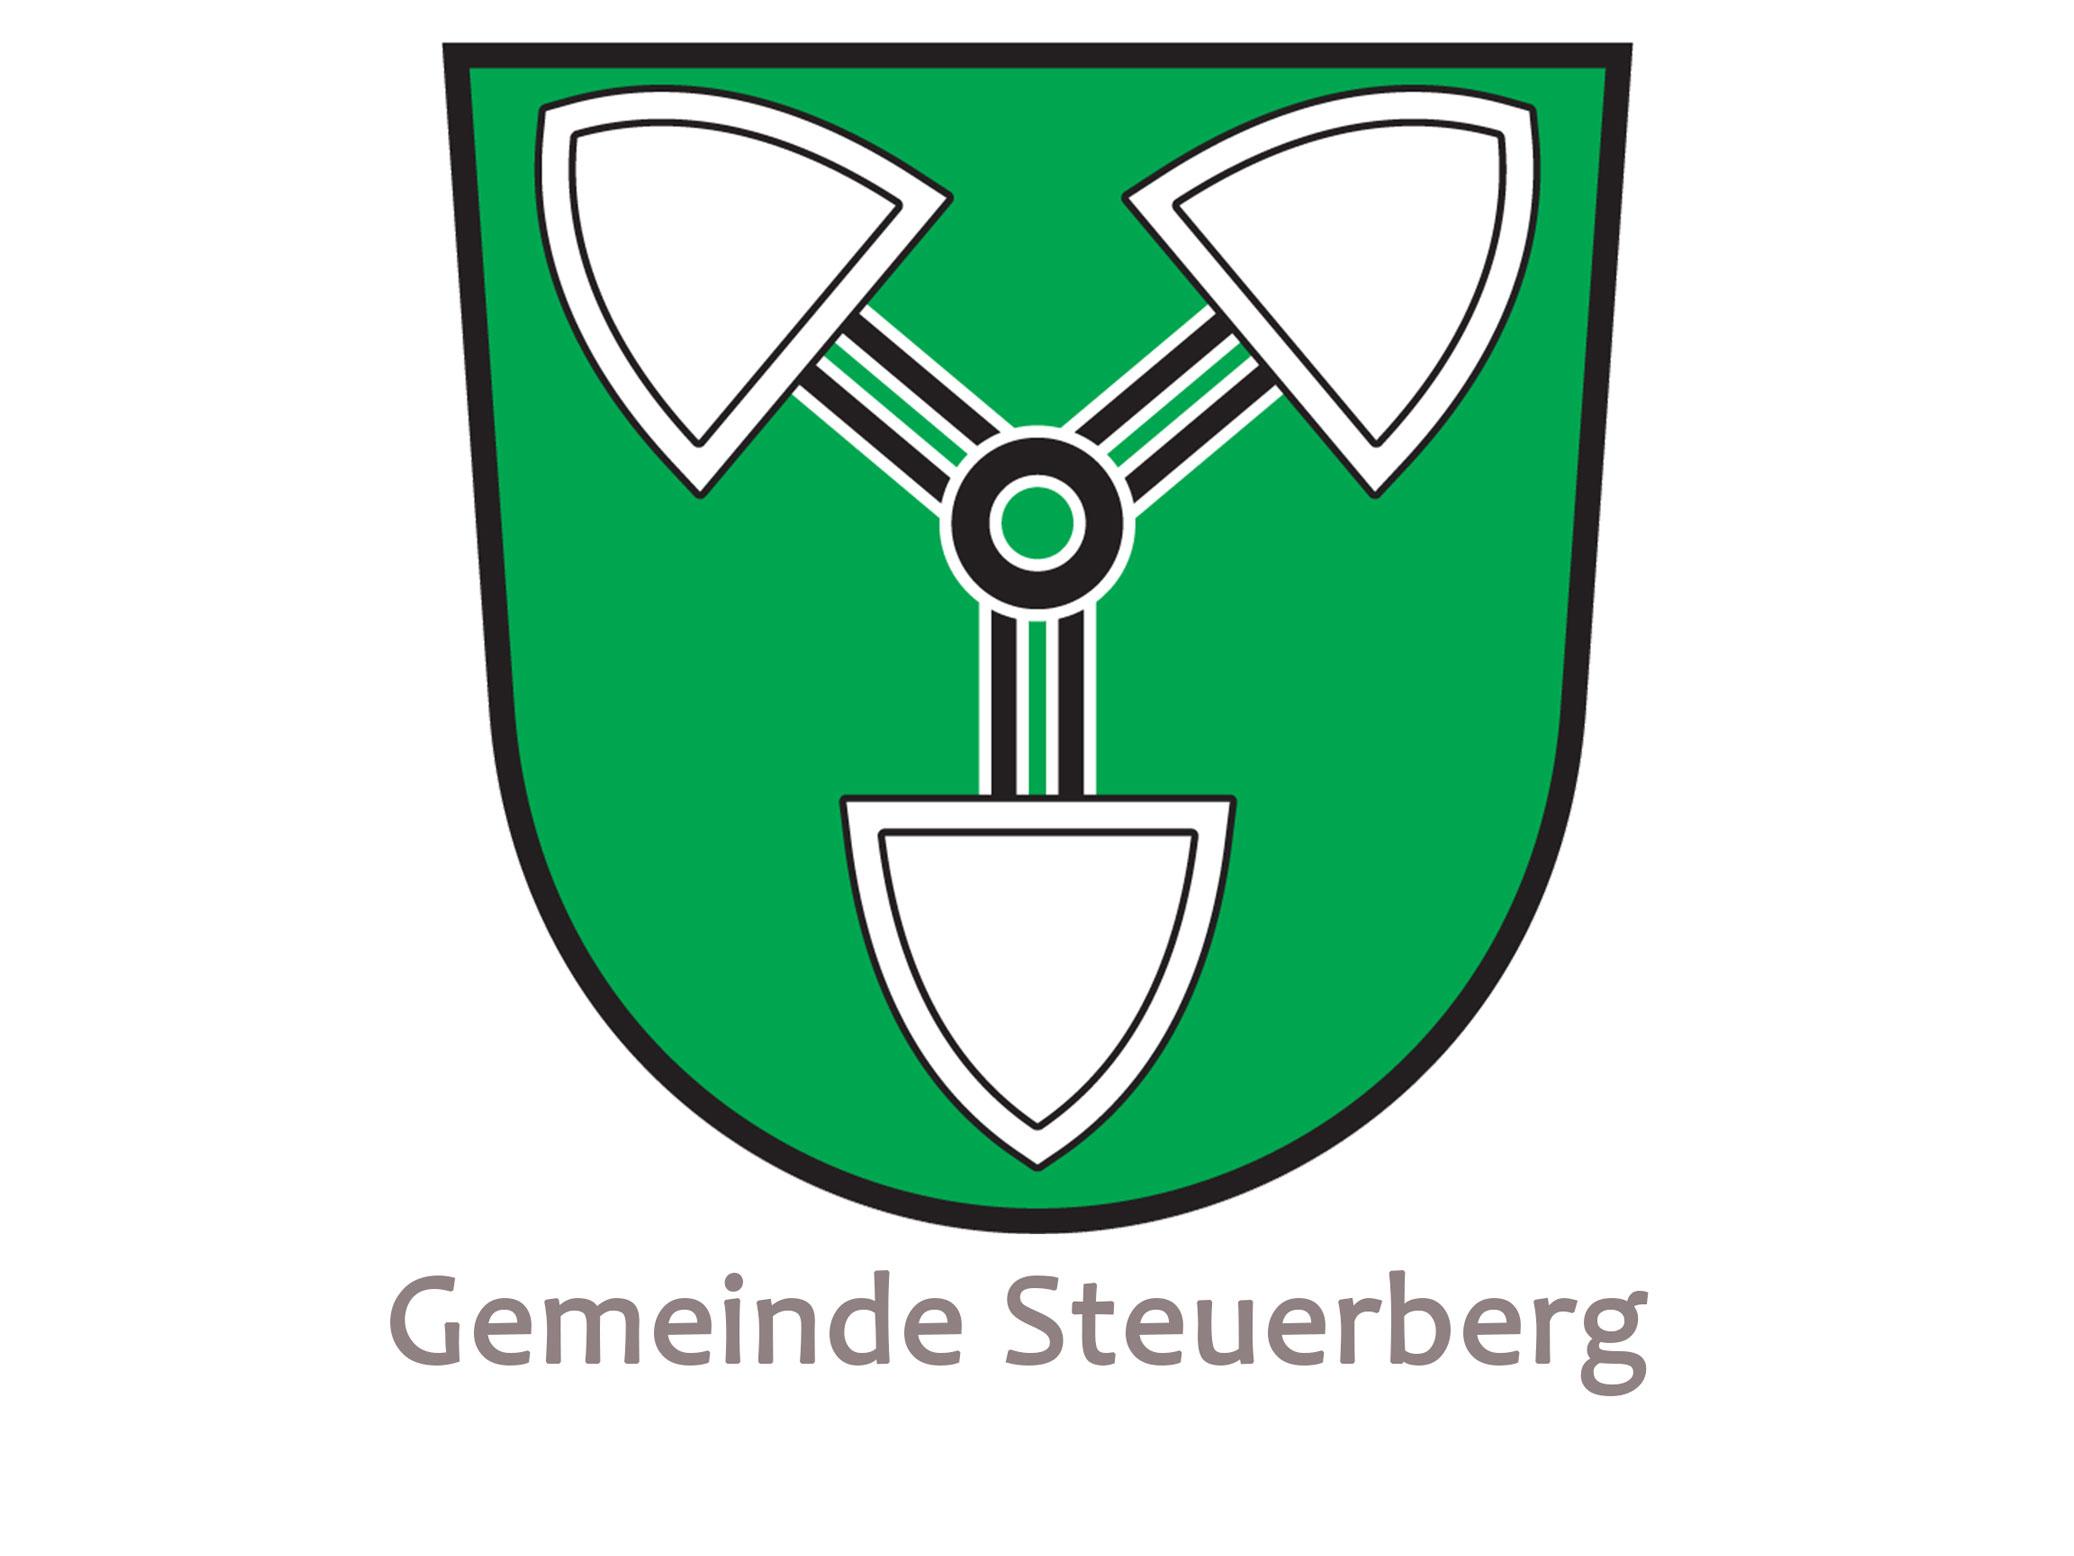 Gemeinde Steuerberg